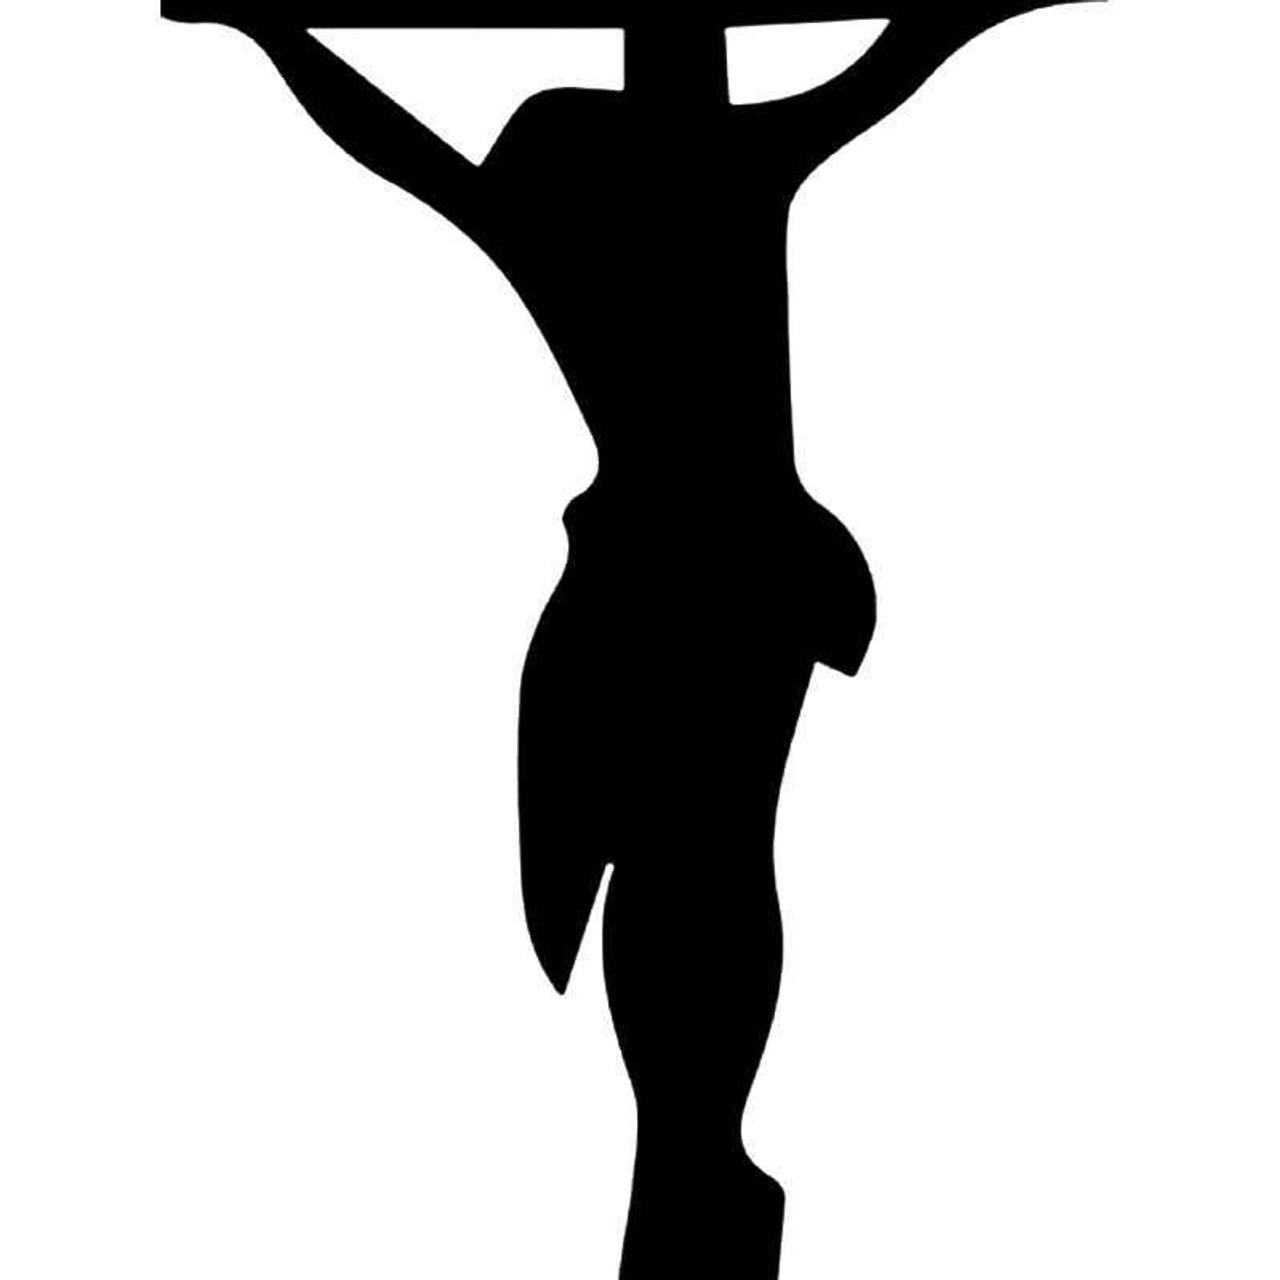 jesus christ cross crucifixion